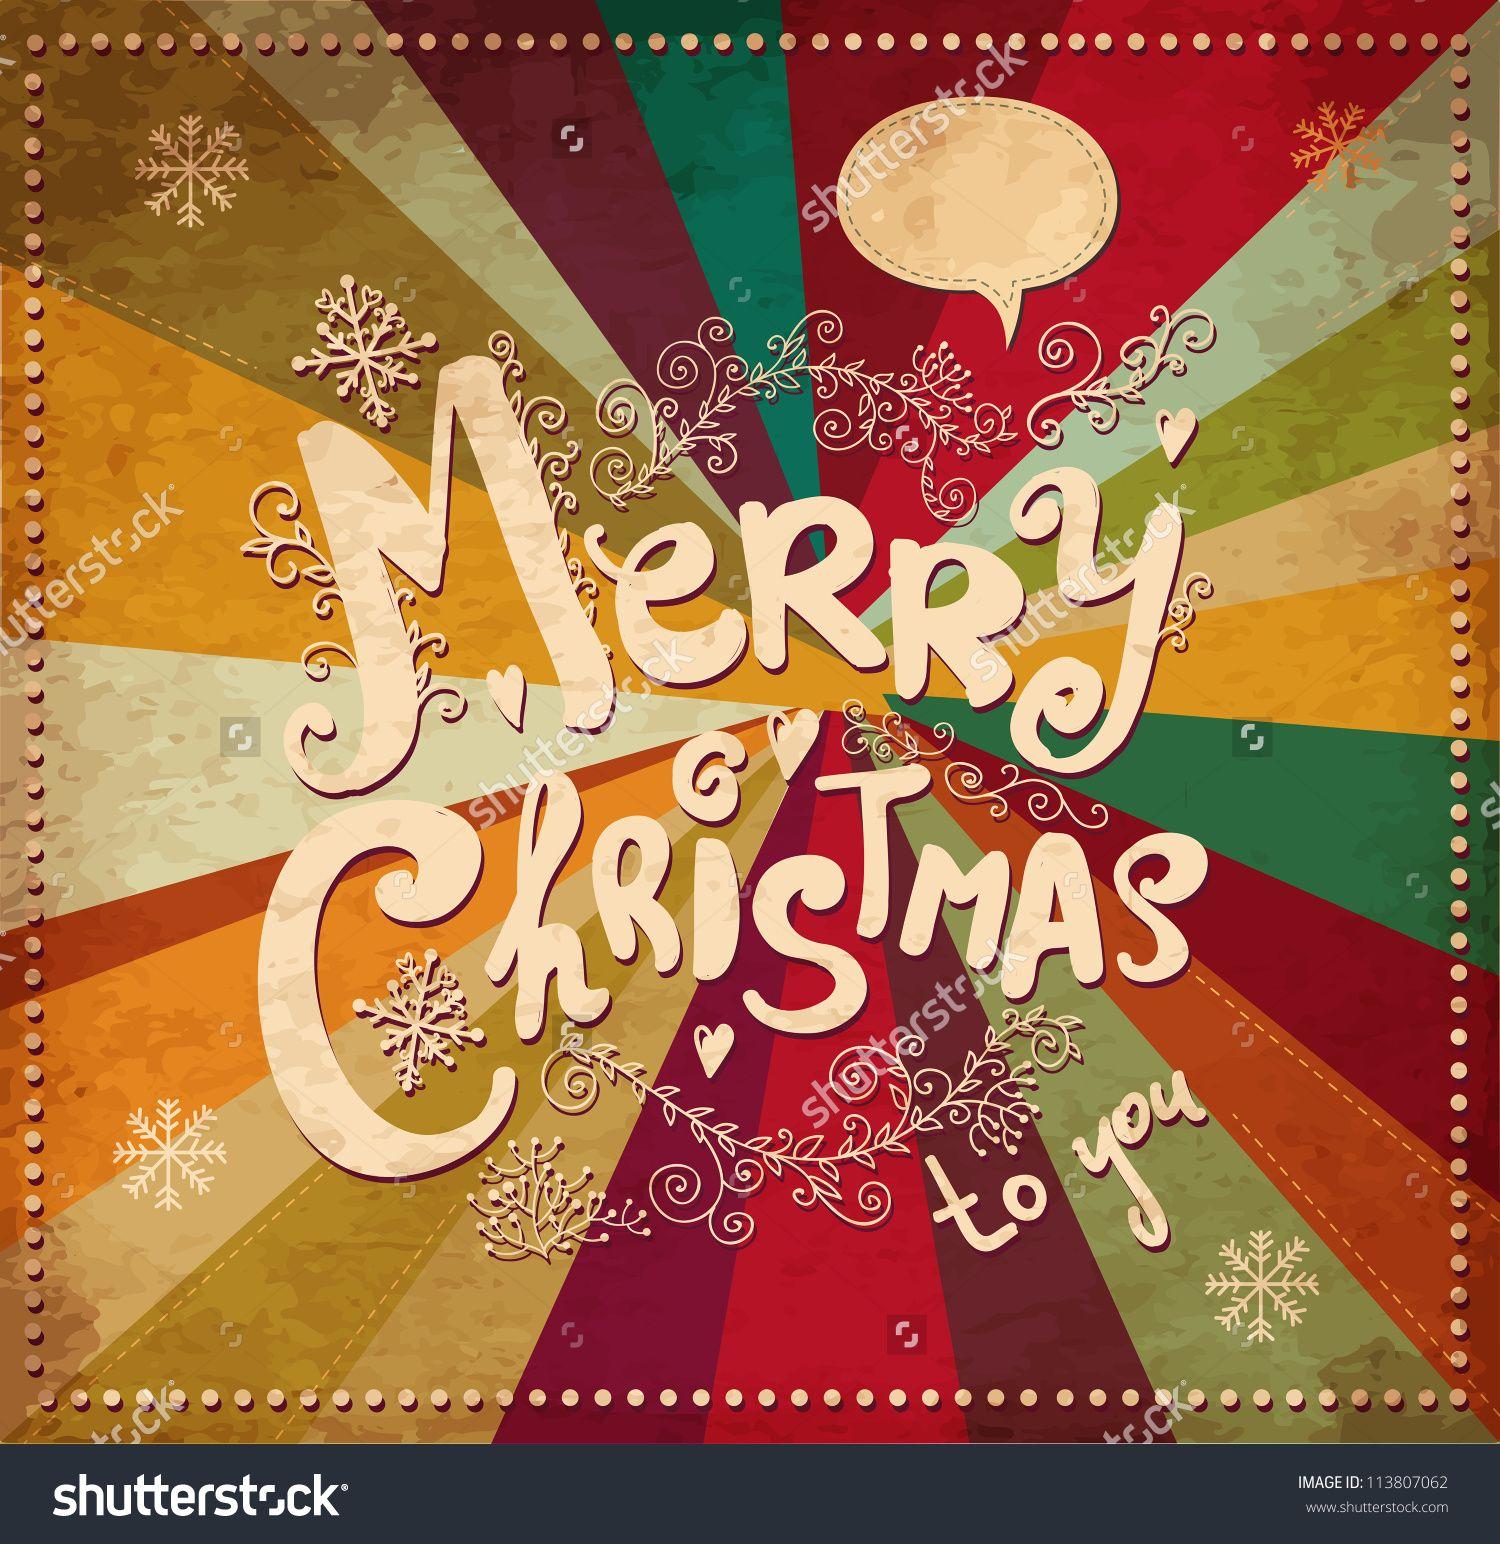 Vintage Vector Christmas Card 113807062 Shutterstock